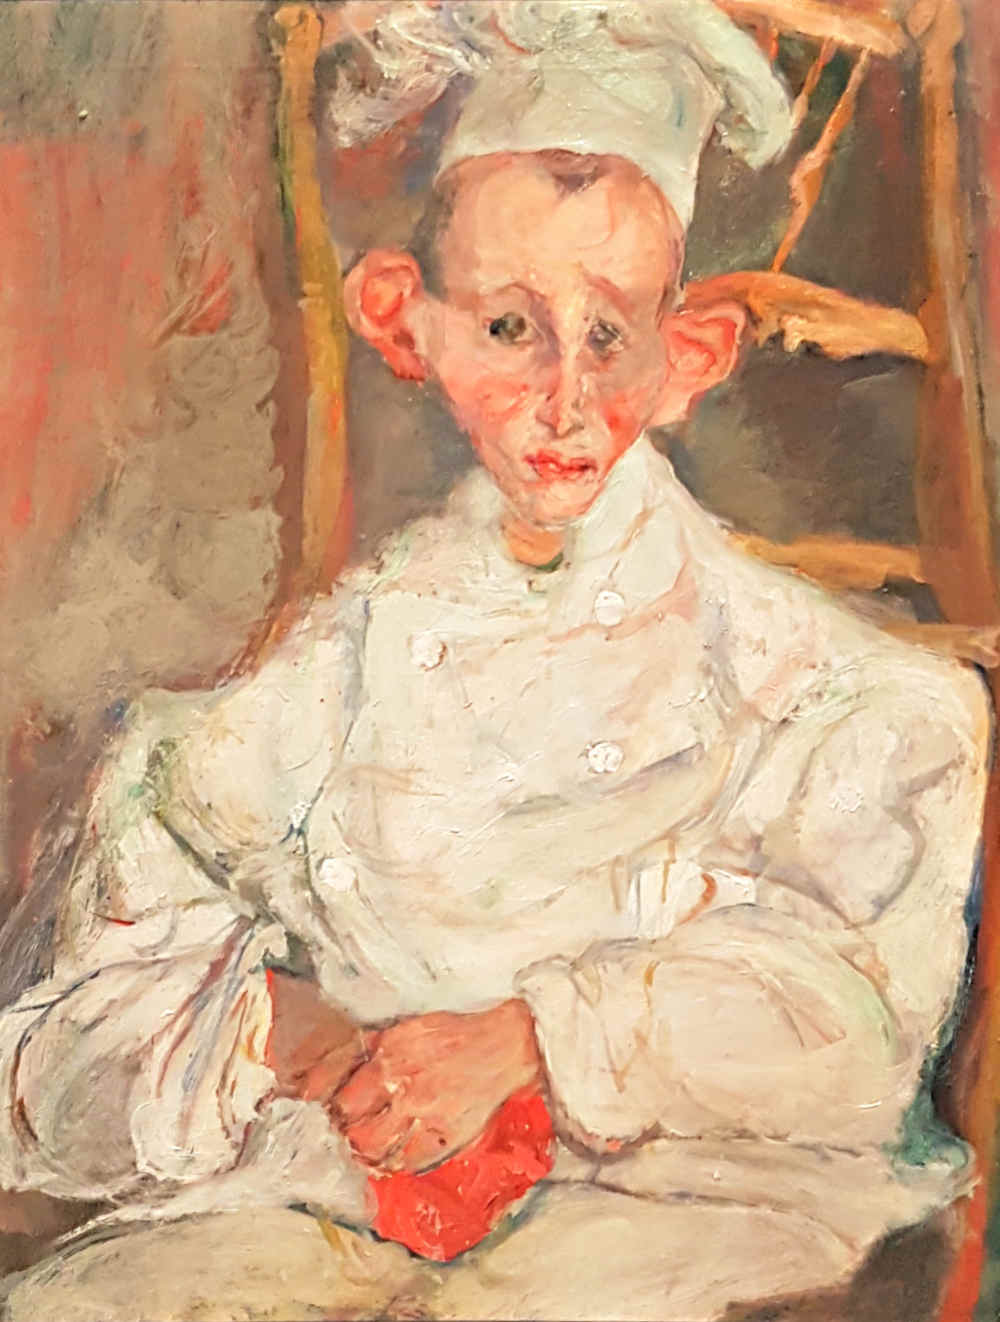 Soutine, Courtauld, London exhibition, Pastry Boy